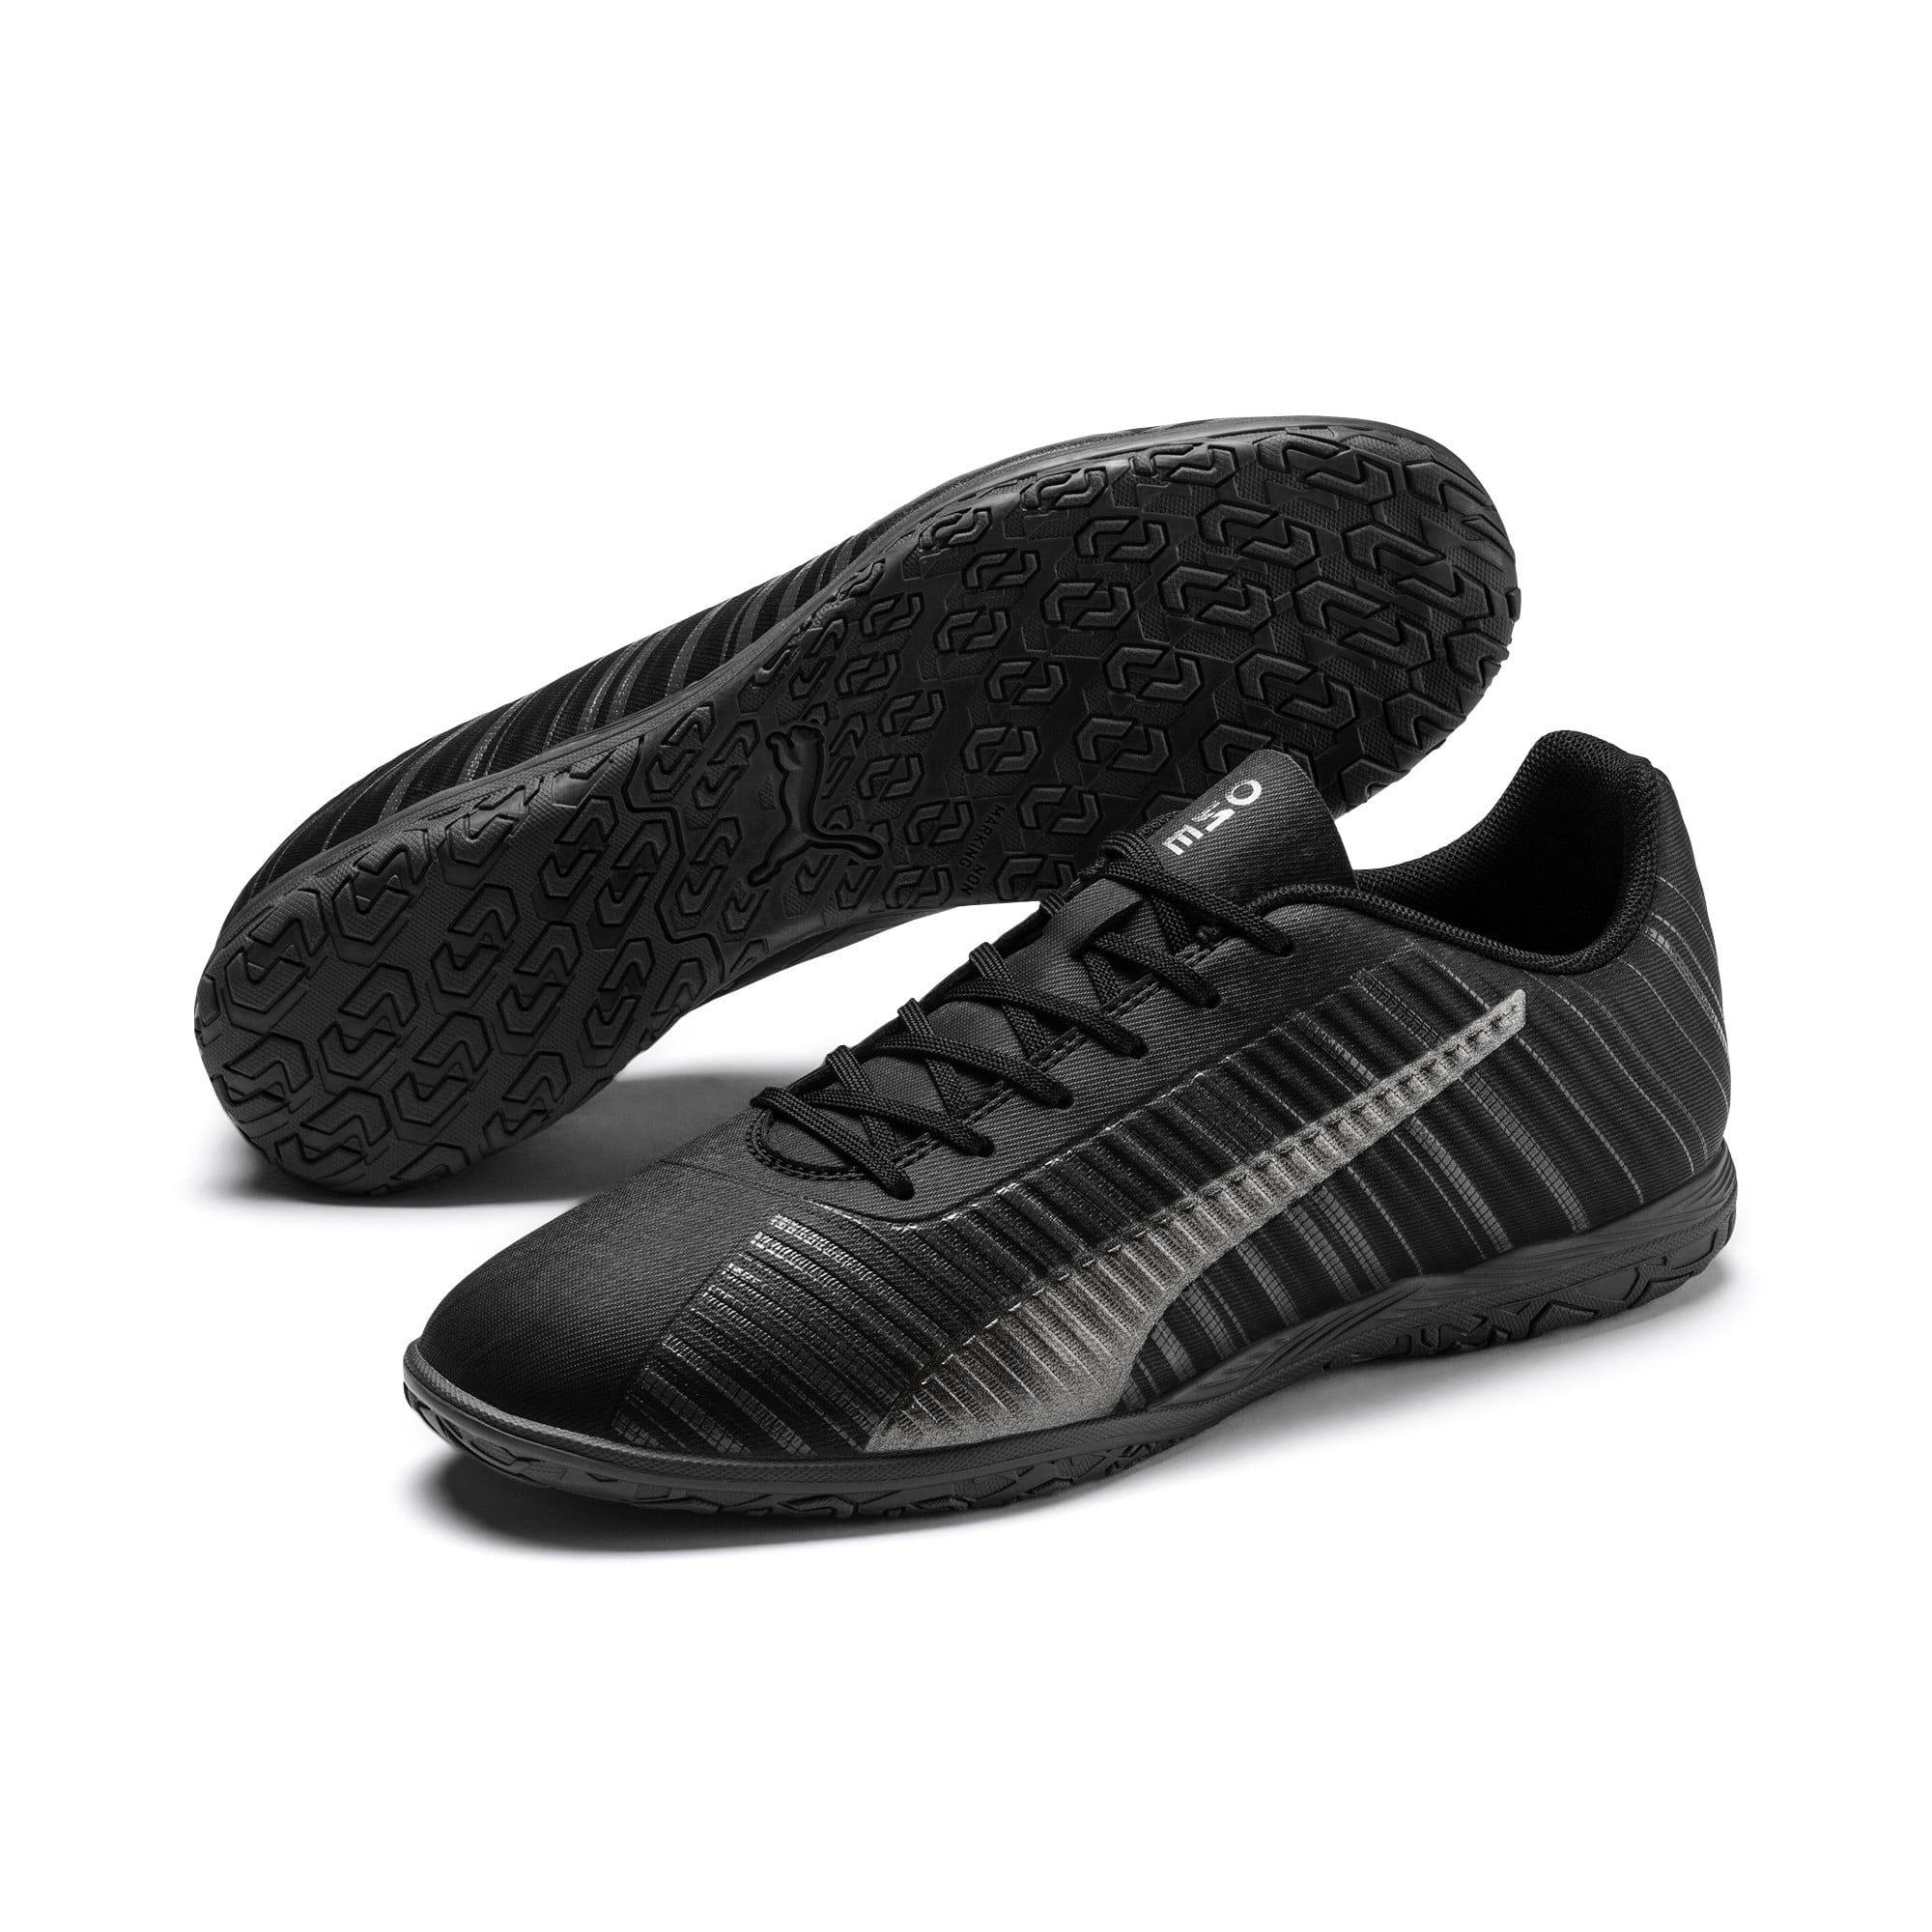 Thumbnail 3 of PUMA ONE 5.4 IT Men's Football Boots, Black-Black-Puma Aged Silver, medium